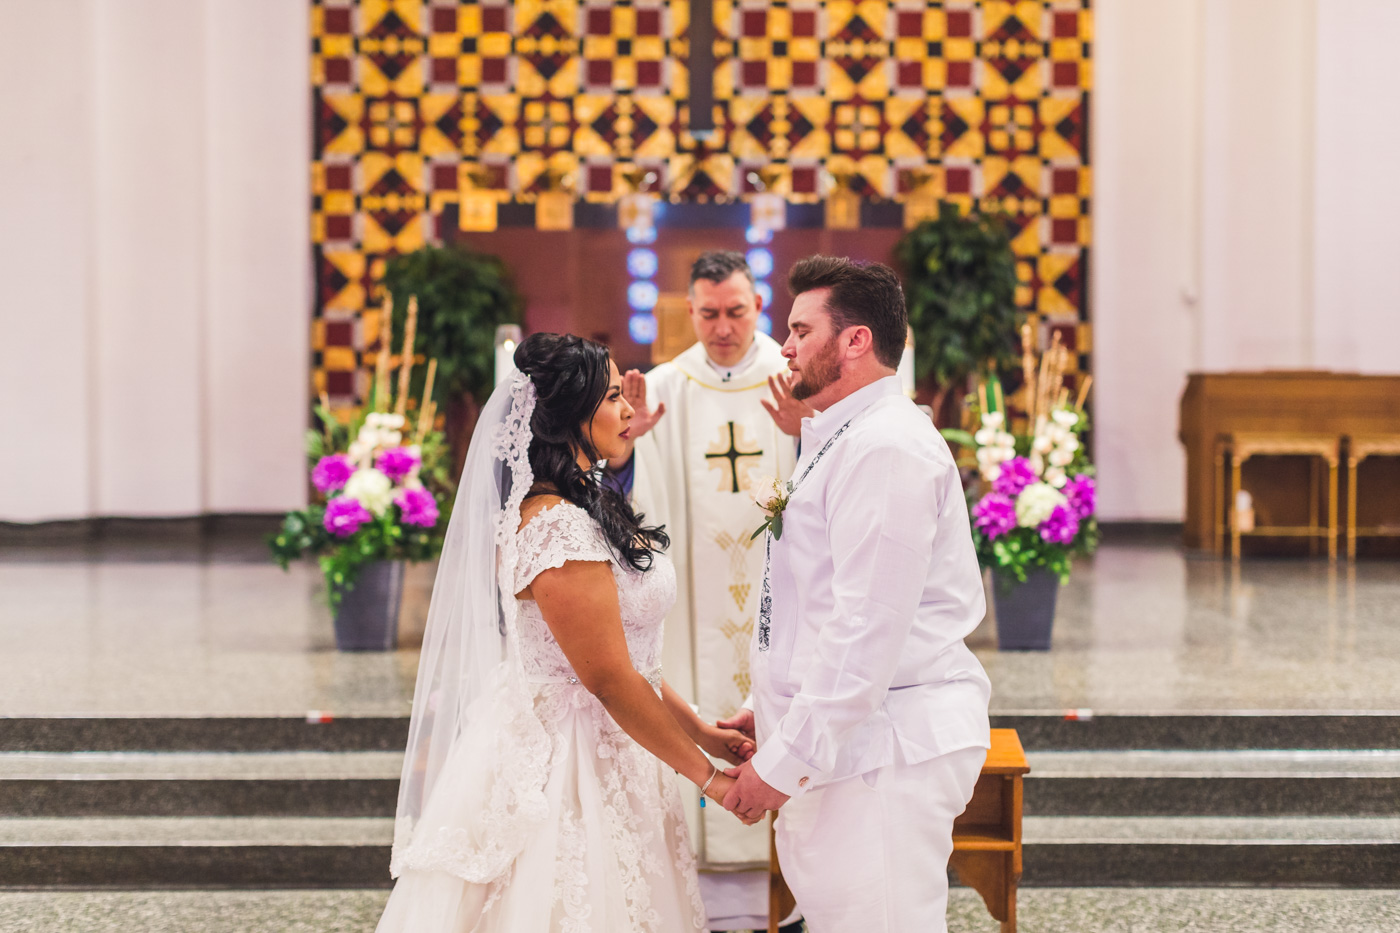 st-gregory-catholic-church-wedding-ceremony